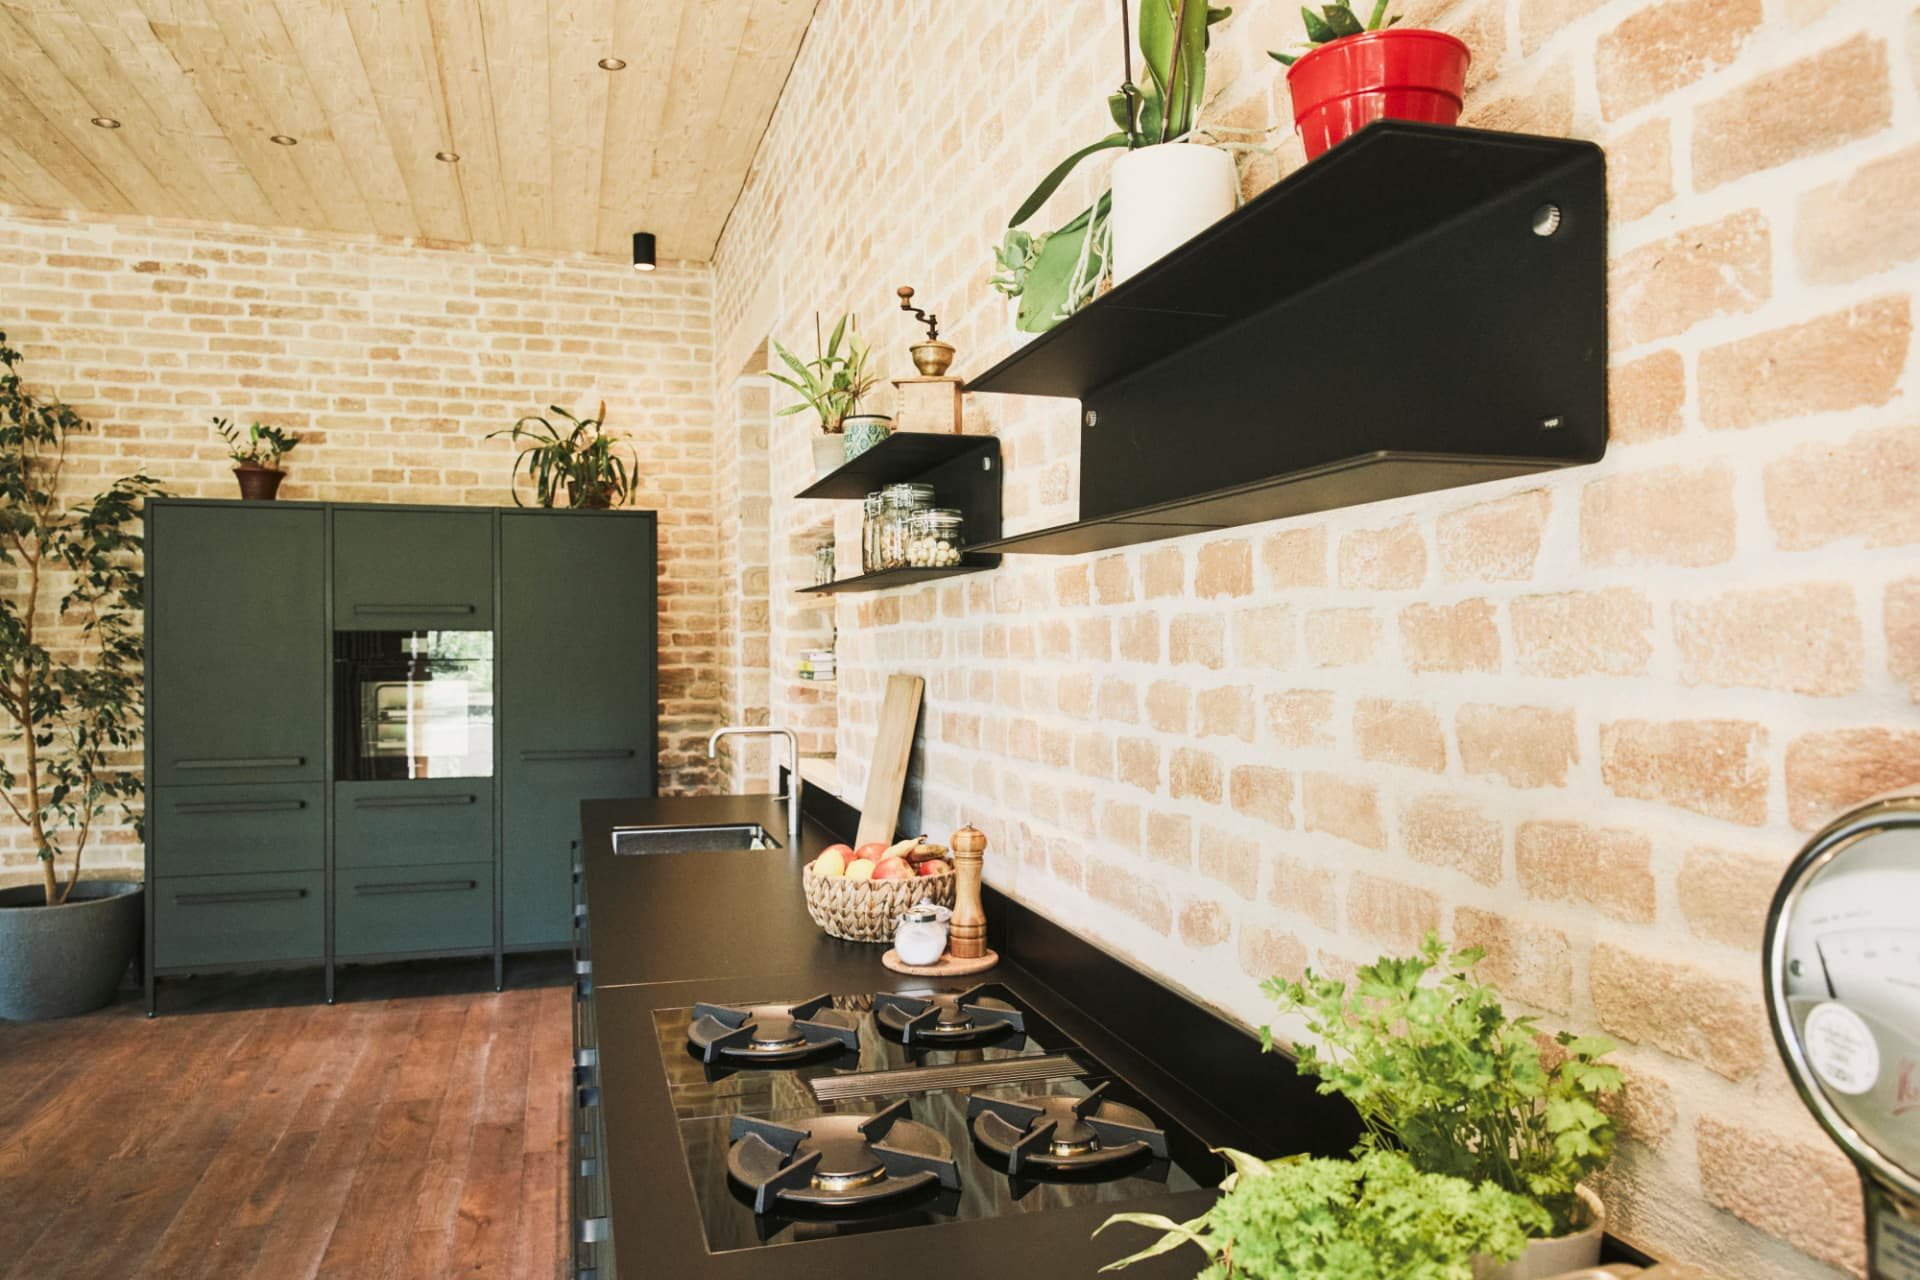 Linoleumküche-dunkelgrün-keep-schwarze-Arbeitsplatte